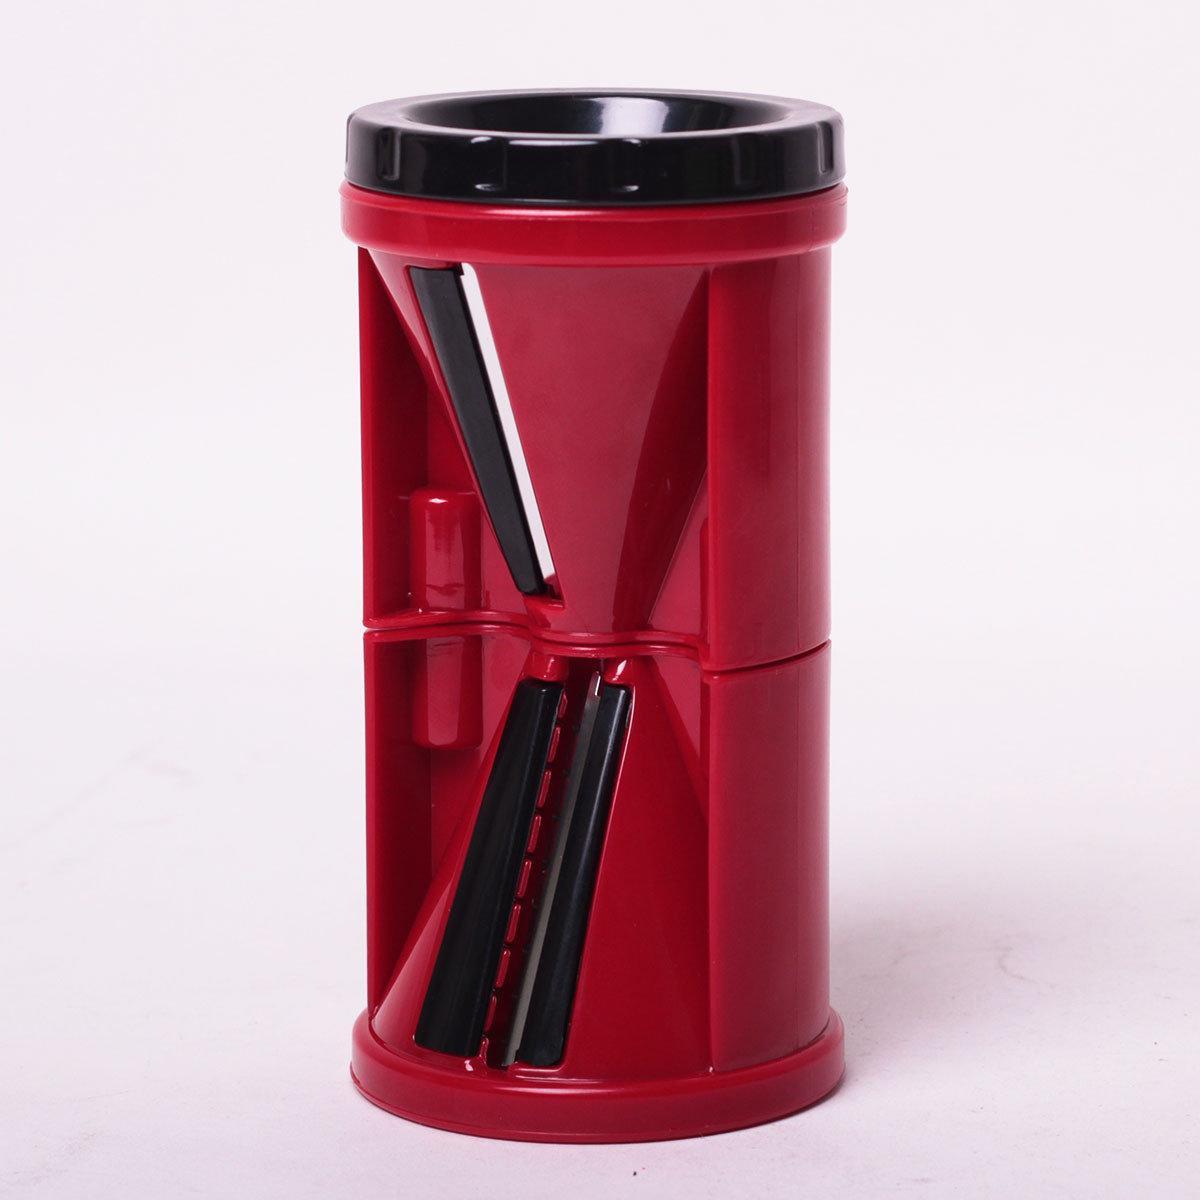 Спиральная шинковка Kamille KM-10087 пластиковая 7*7*13,5 см красная